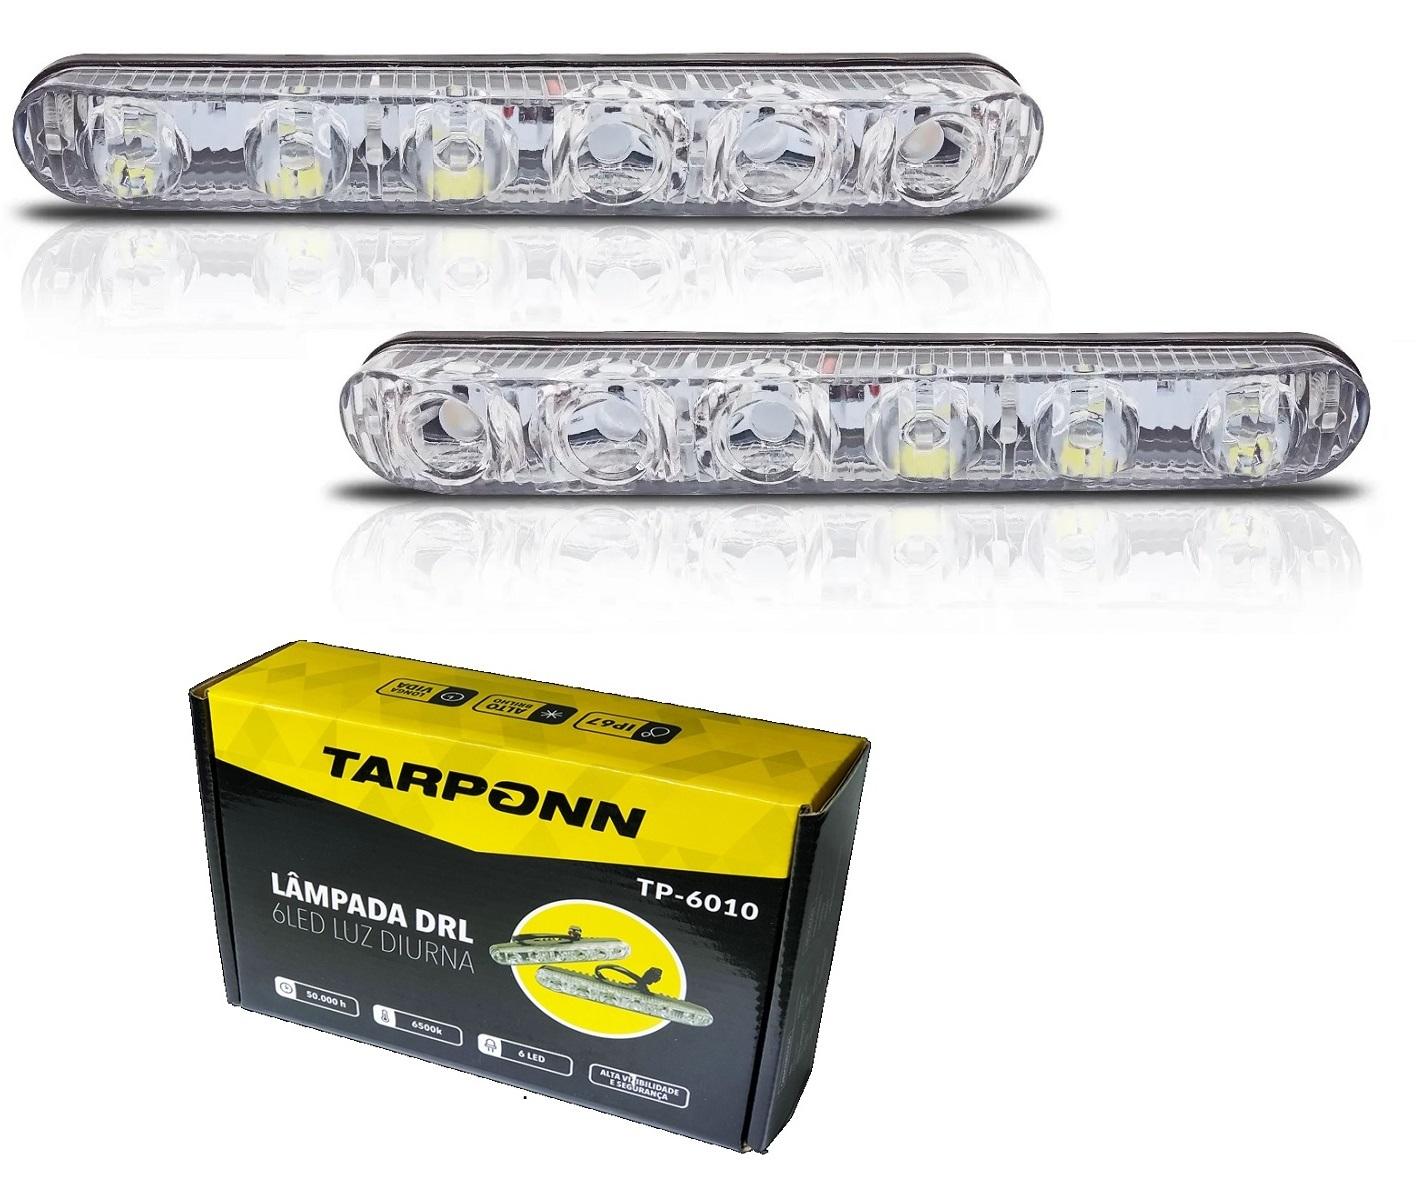 FAROL LED AUXILIAR MILHA DRL 6 LEDs 6500k LUZ DIURNA